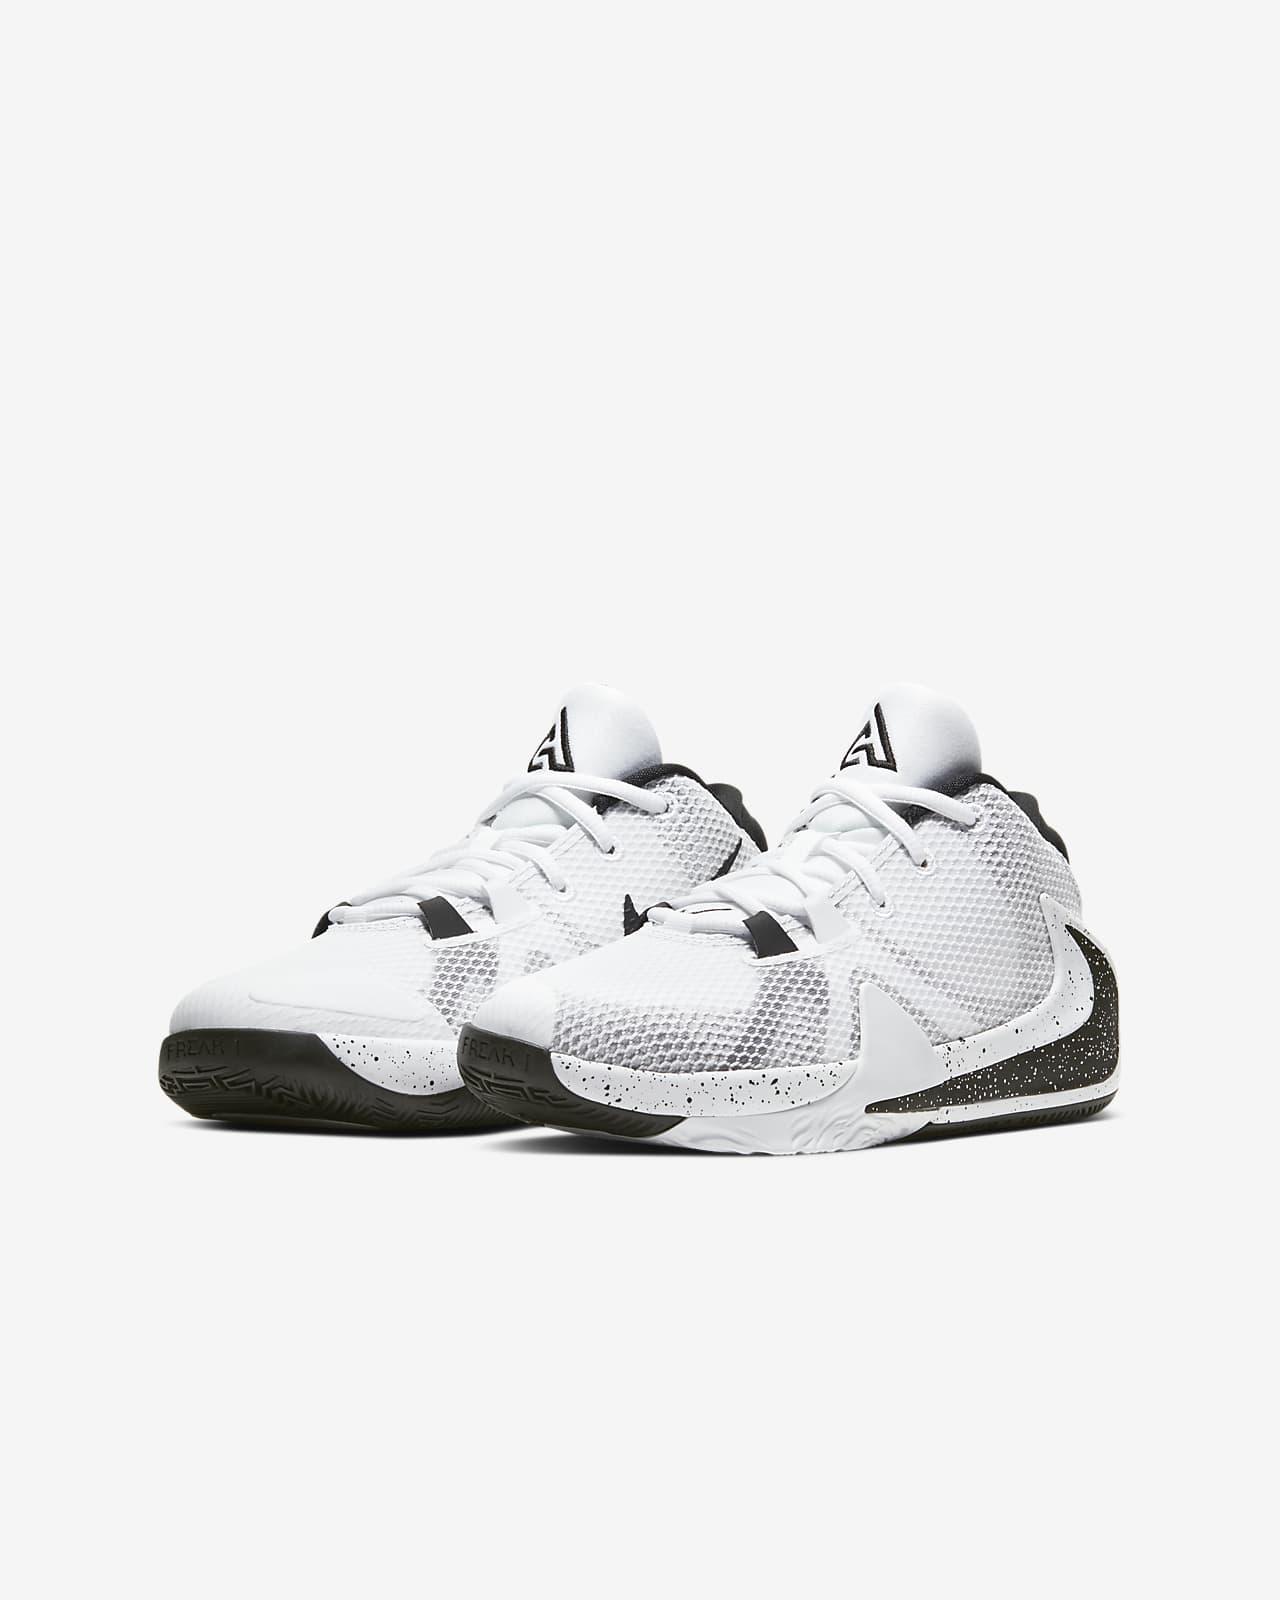 Freak 1 Older Kids' Shoe. Nike SG